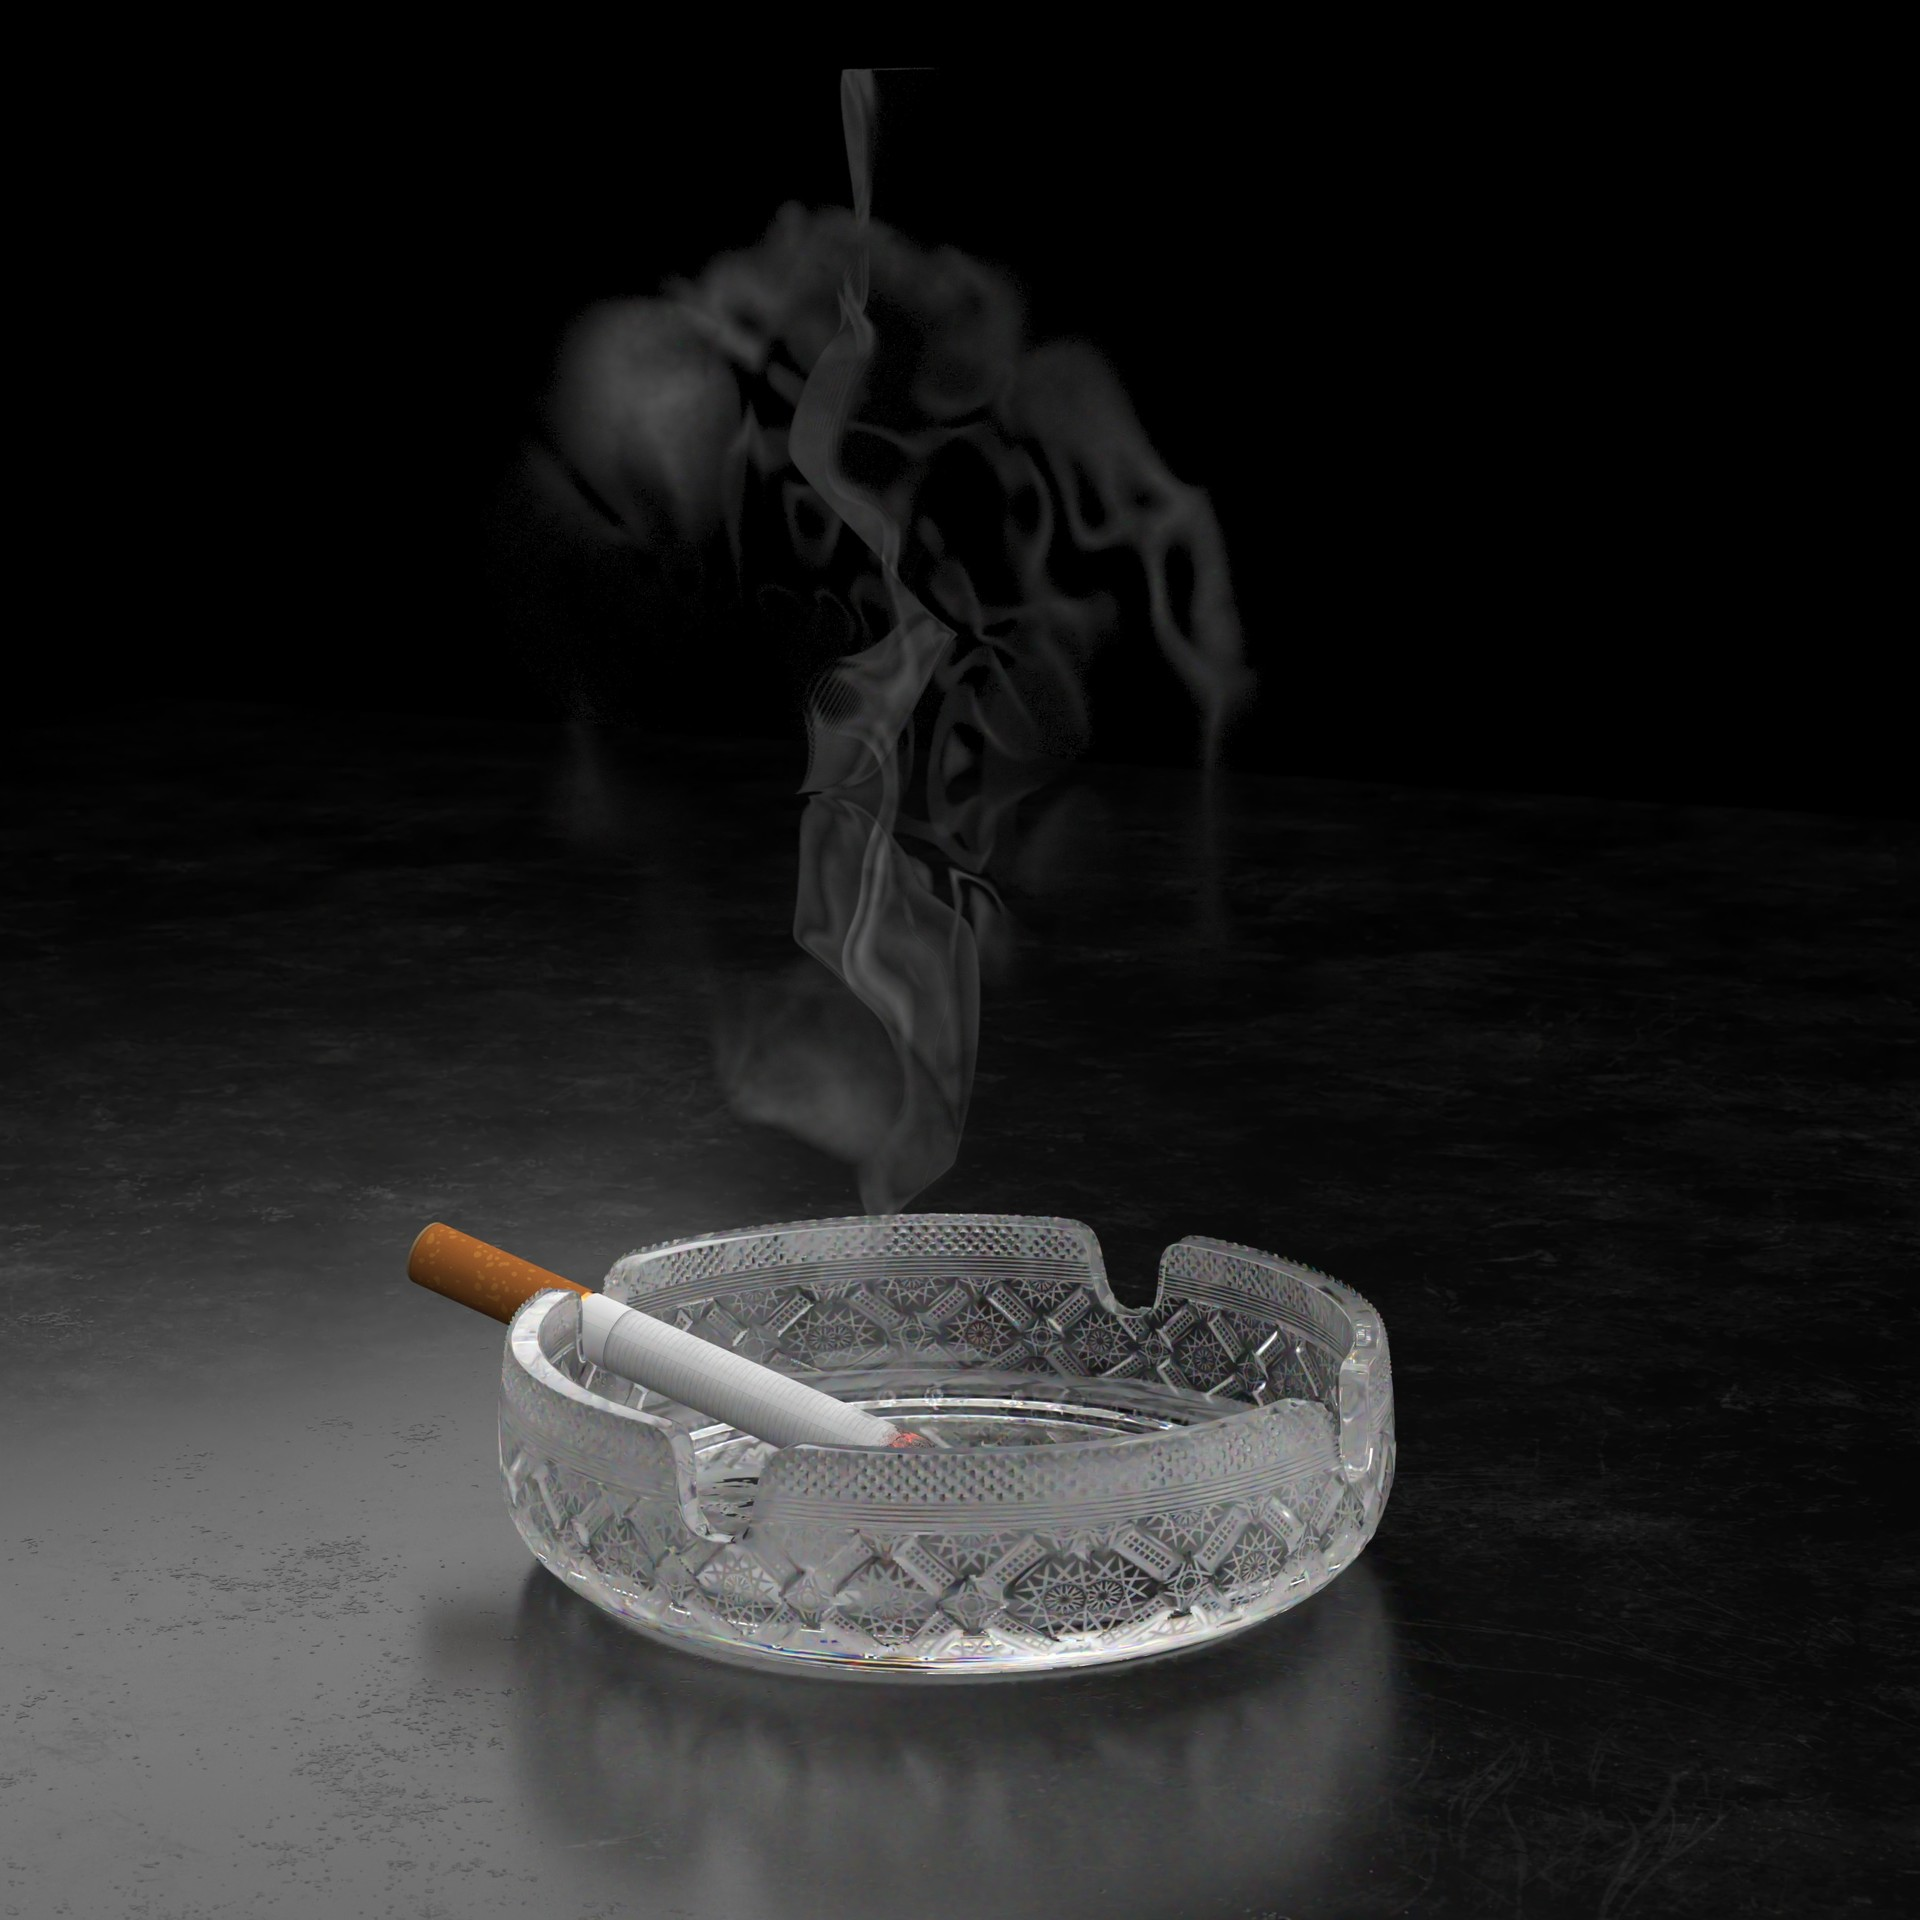 Cem tezcan smoke 00000 denoised beauty